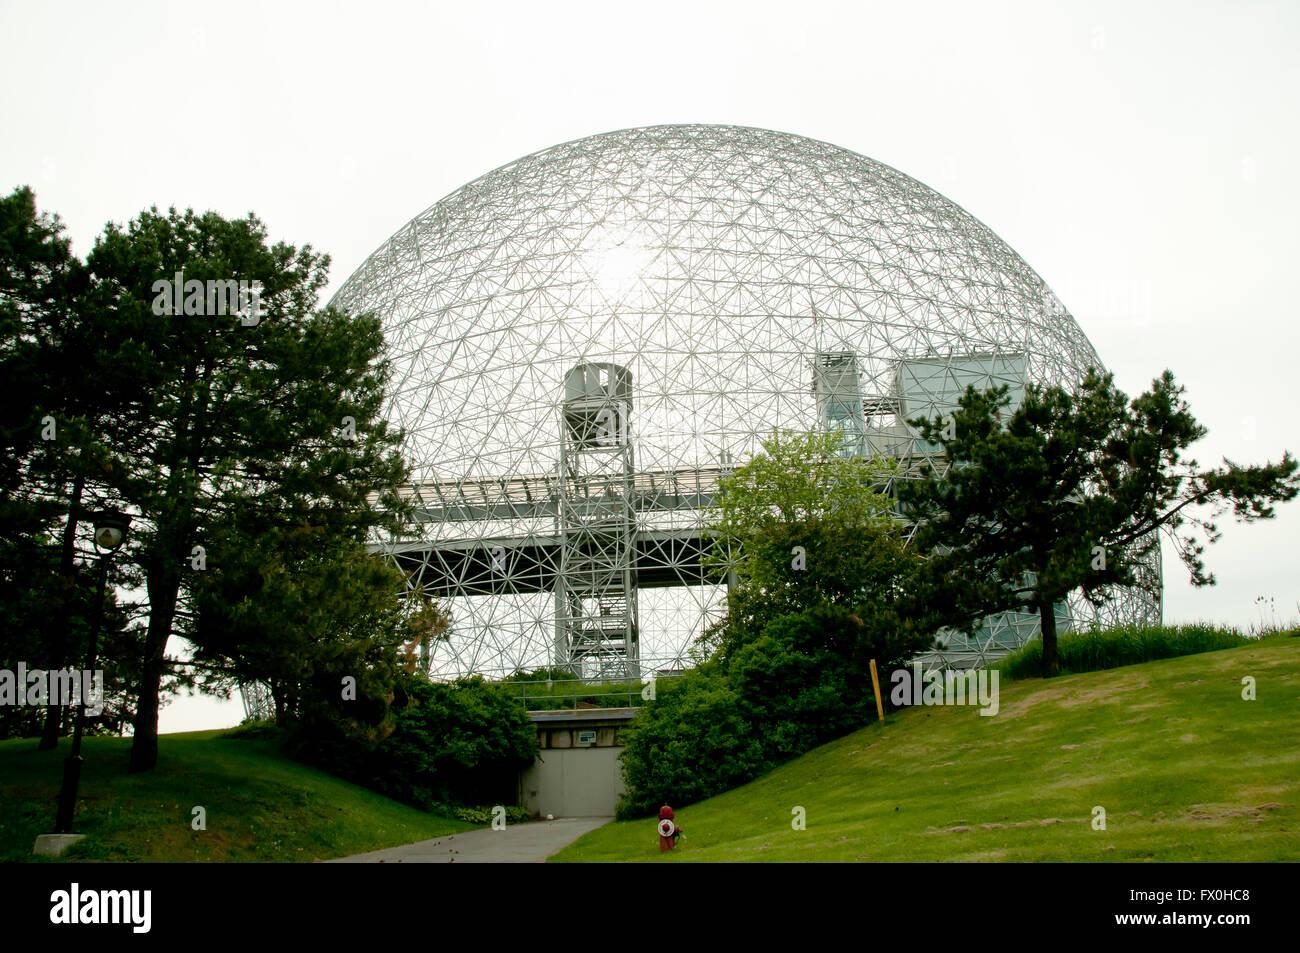 Biosphere - Montreal - Canada - Stock Image